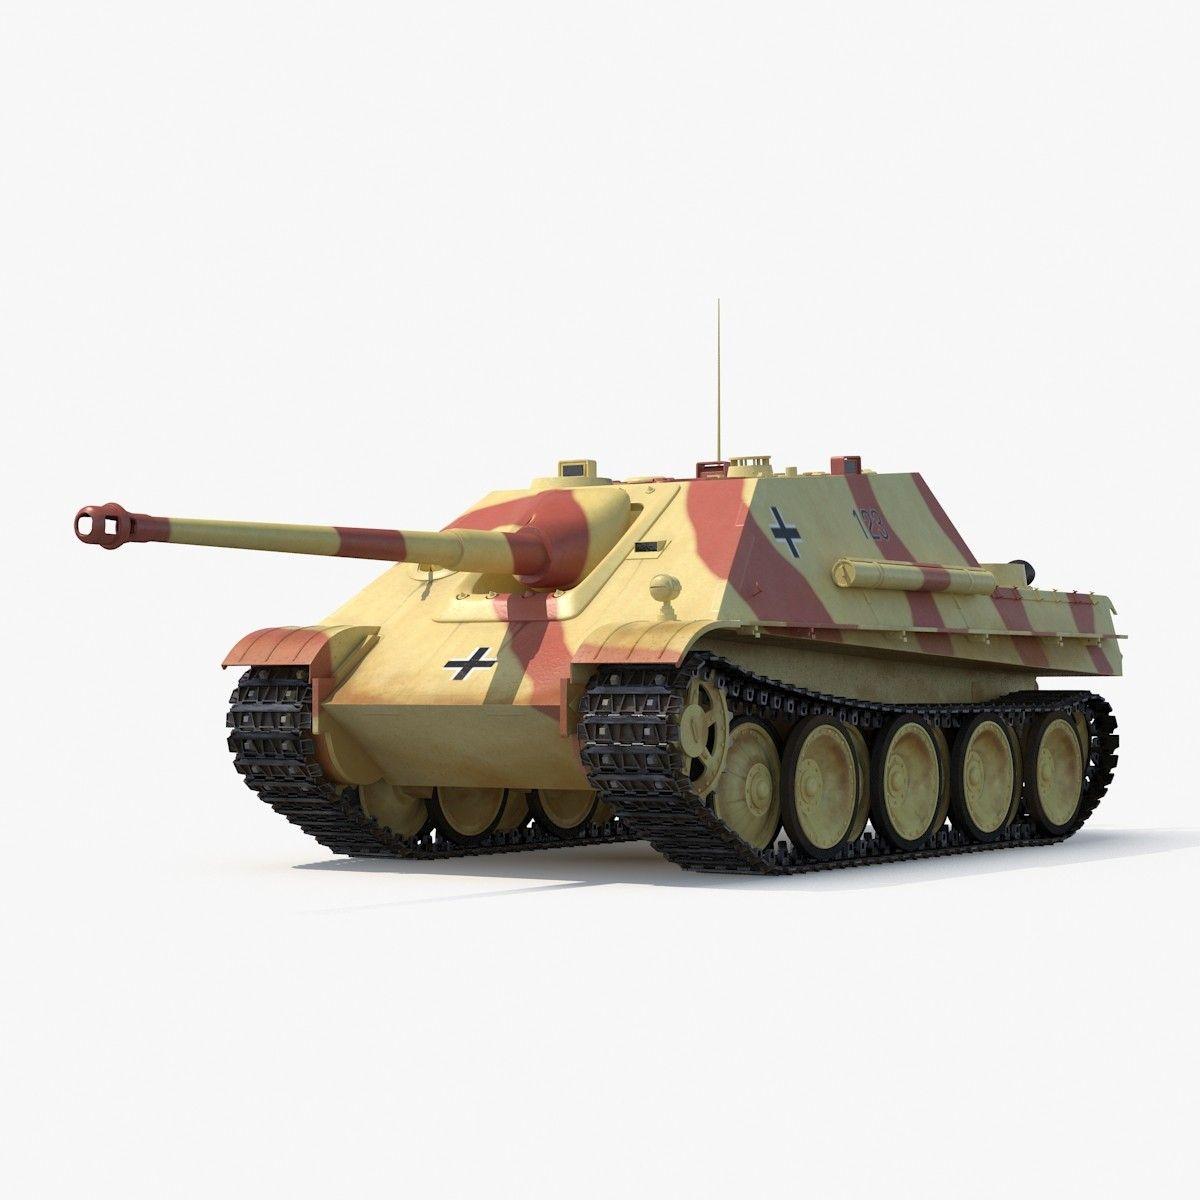 3d model jagdpanther tank destroyer   Военная техника   Pinterest ...